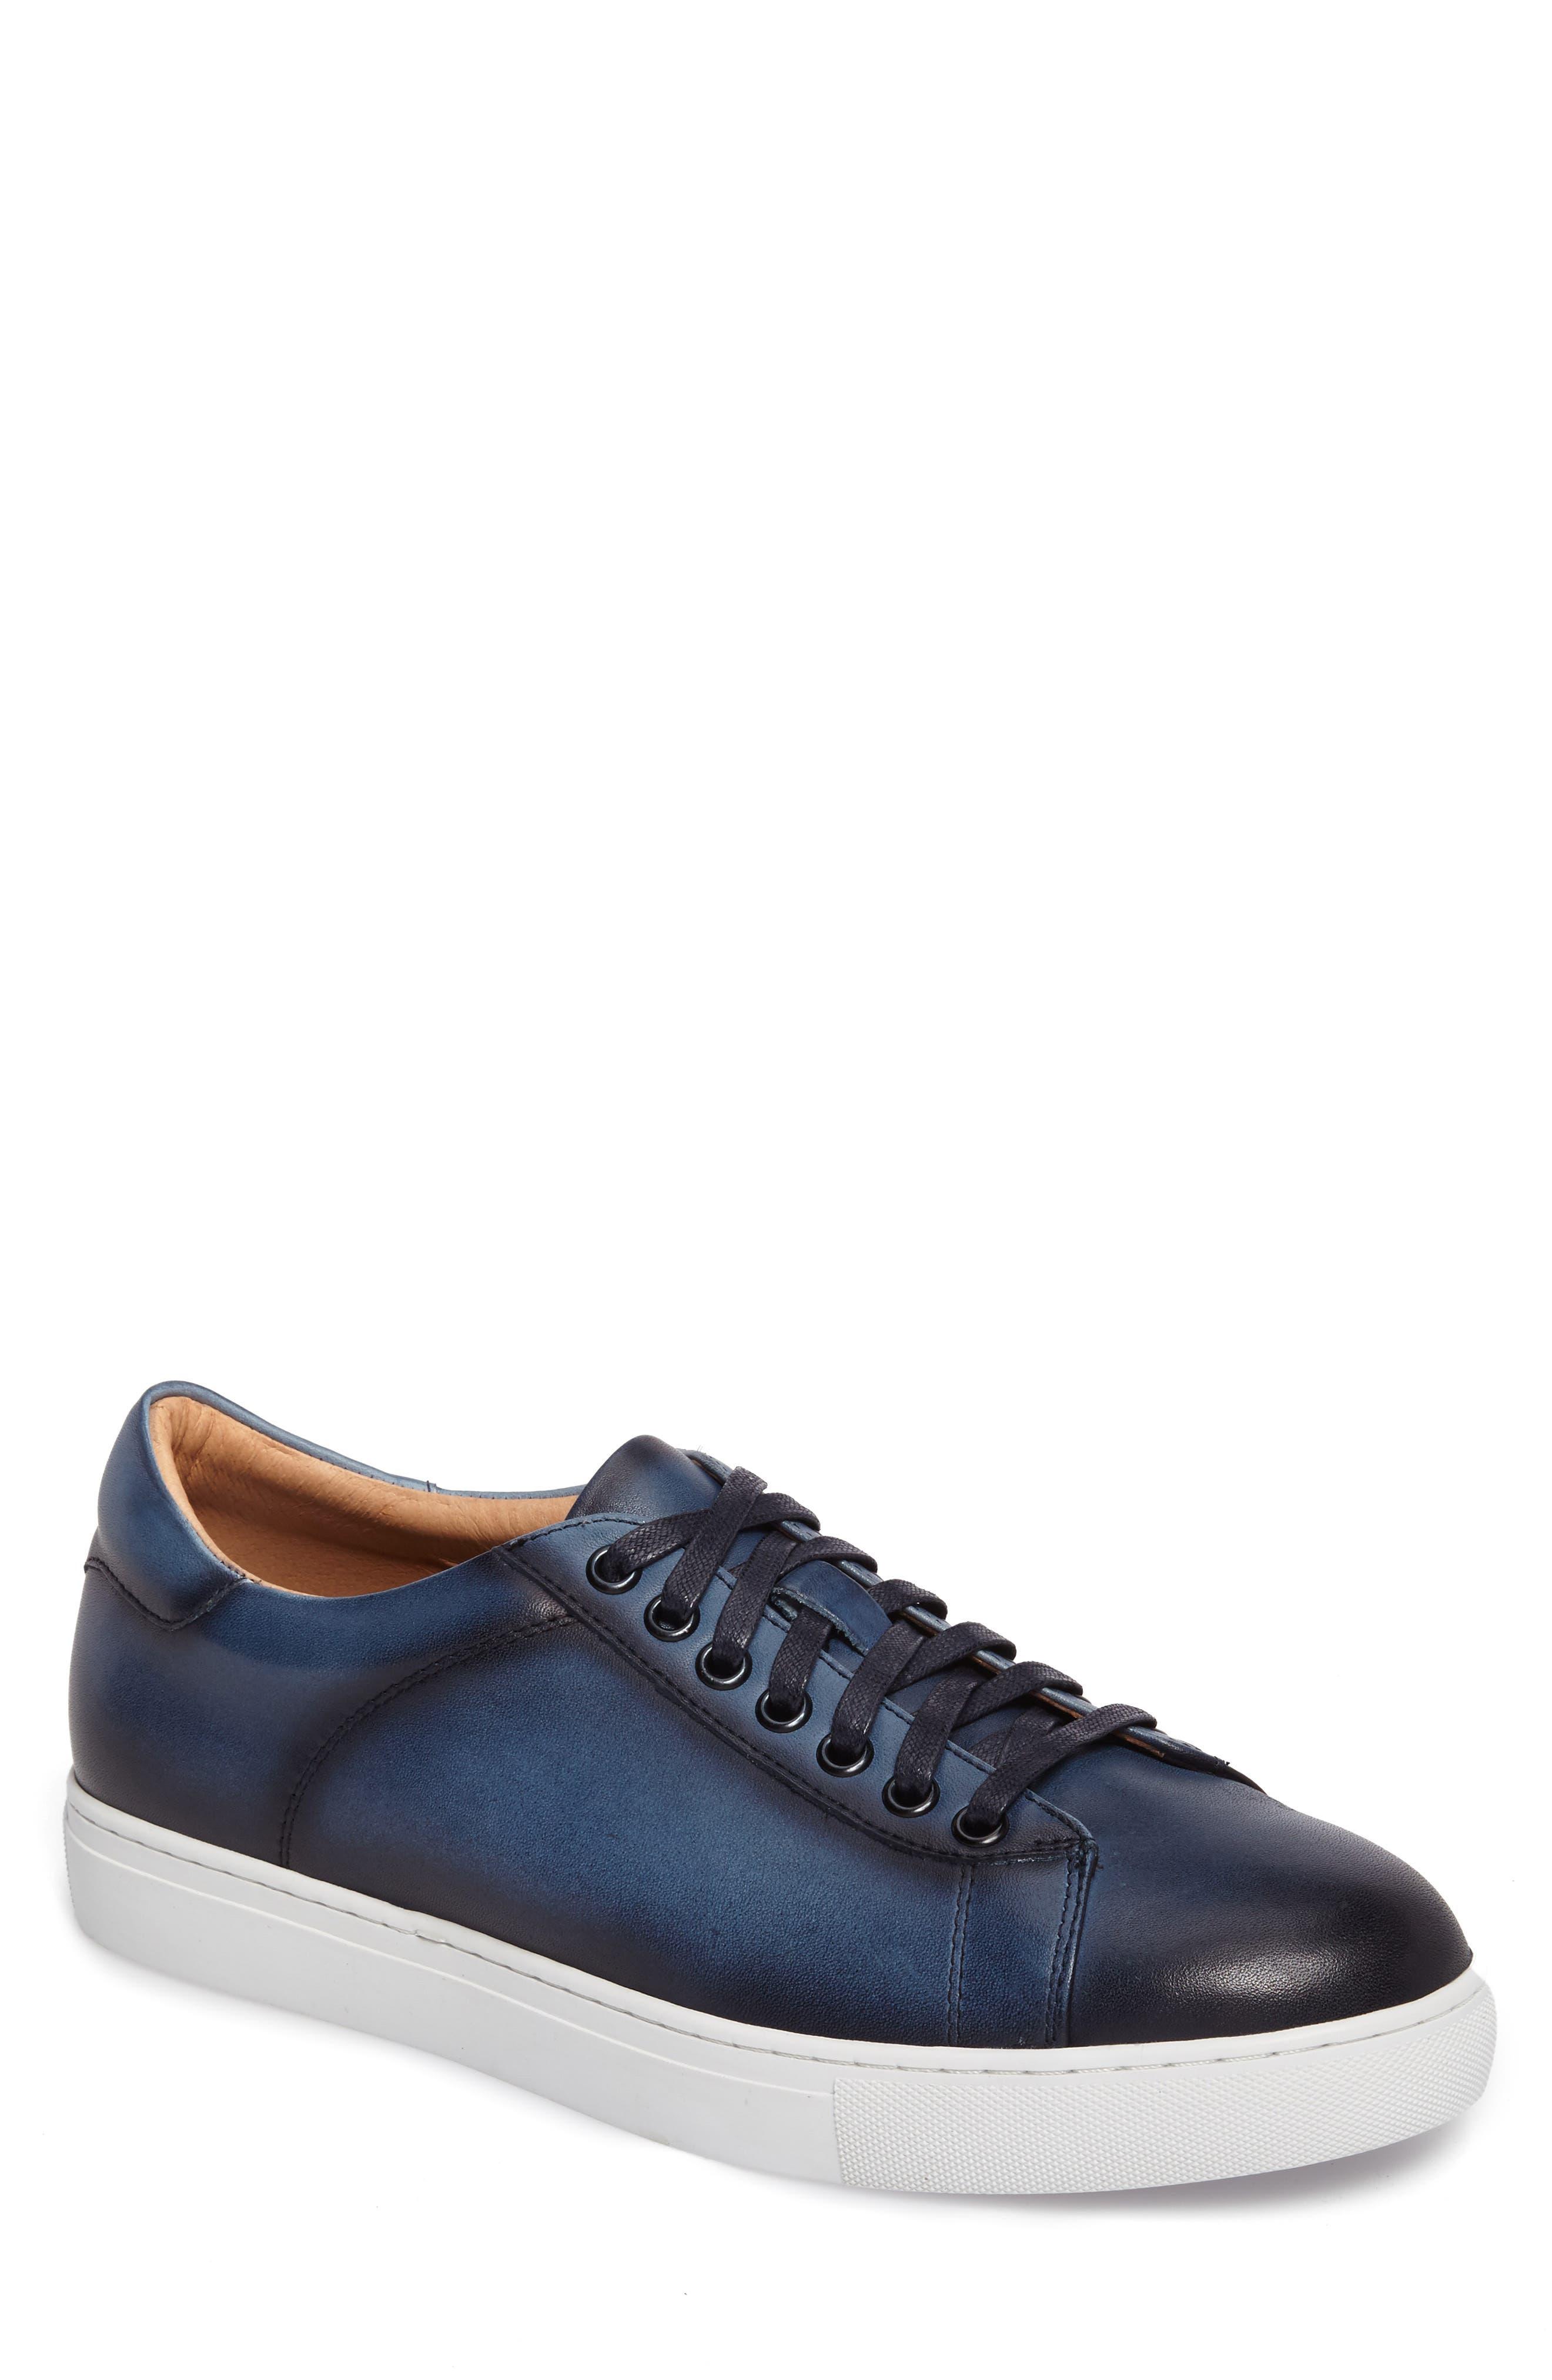 Penrose Sneaker,                             Main thumbnail 1, color,                             410